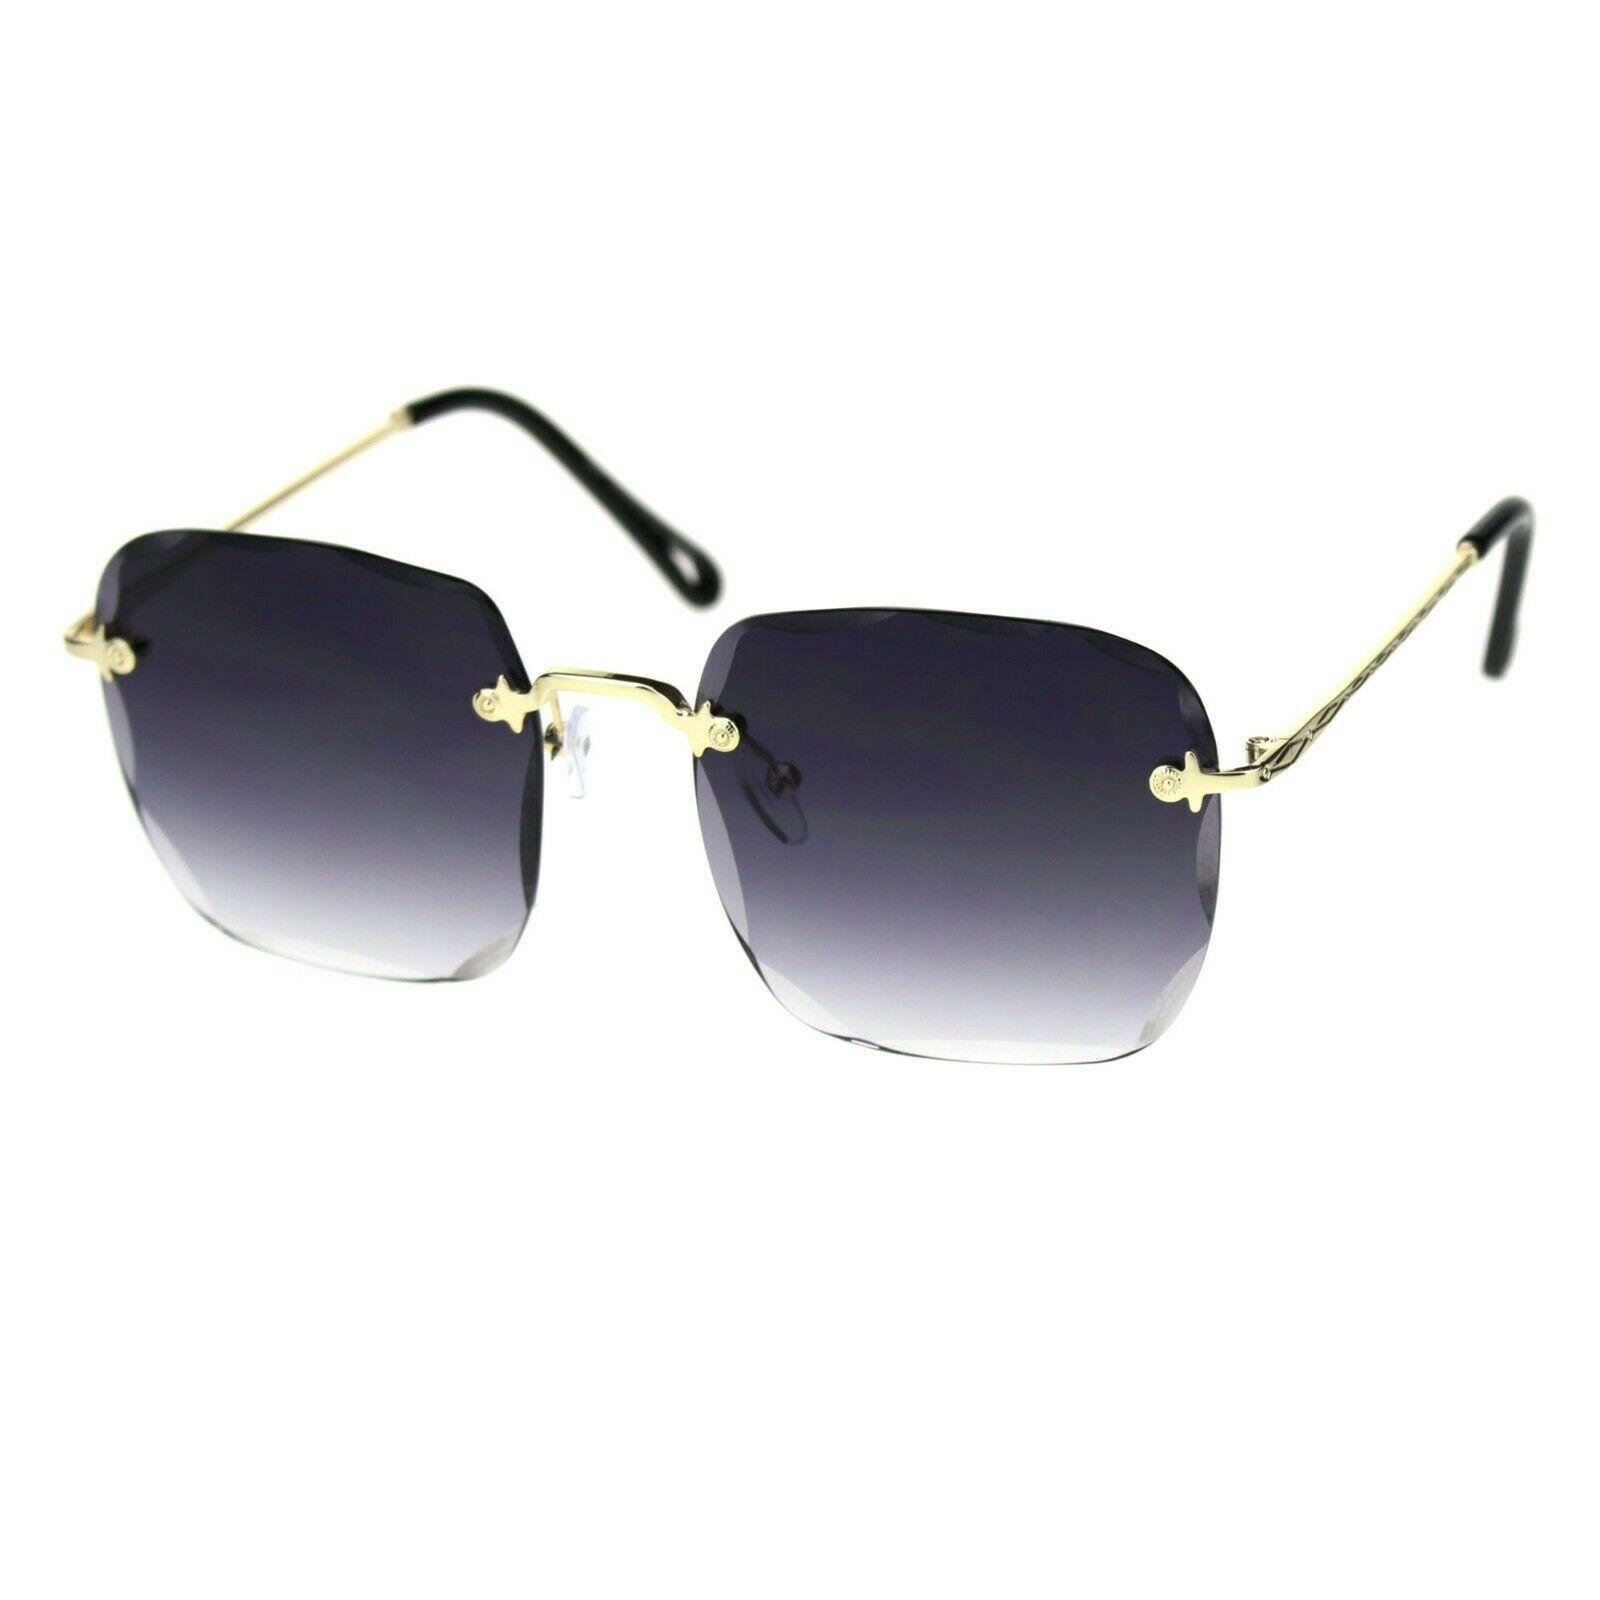 Womens Rimless Square Sunglasses Scallop Beveled Lens Gold Rim UV 400